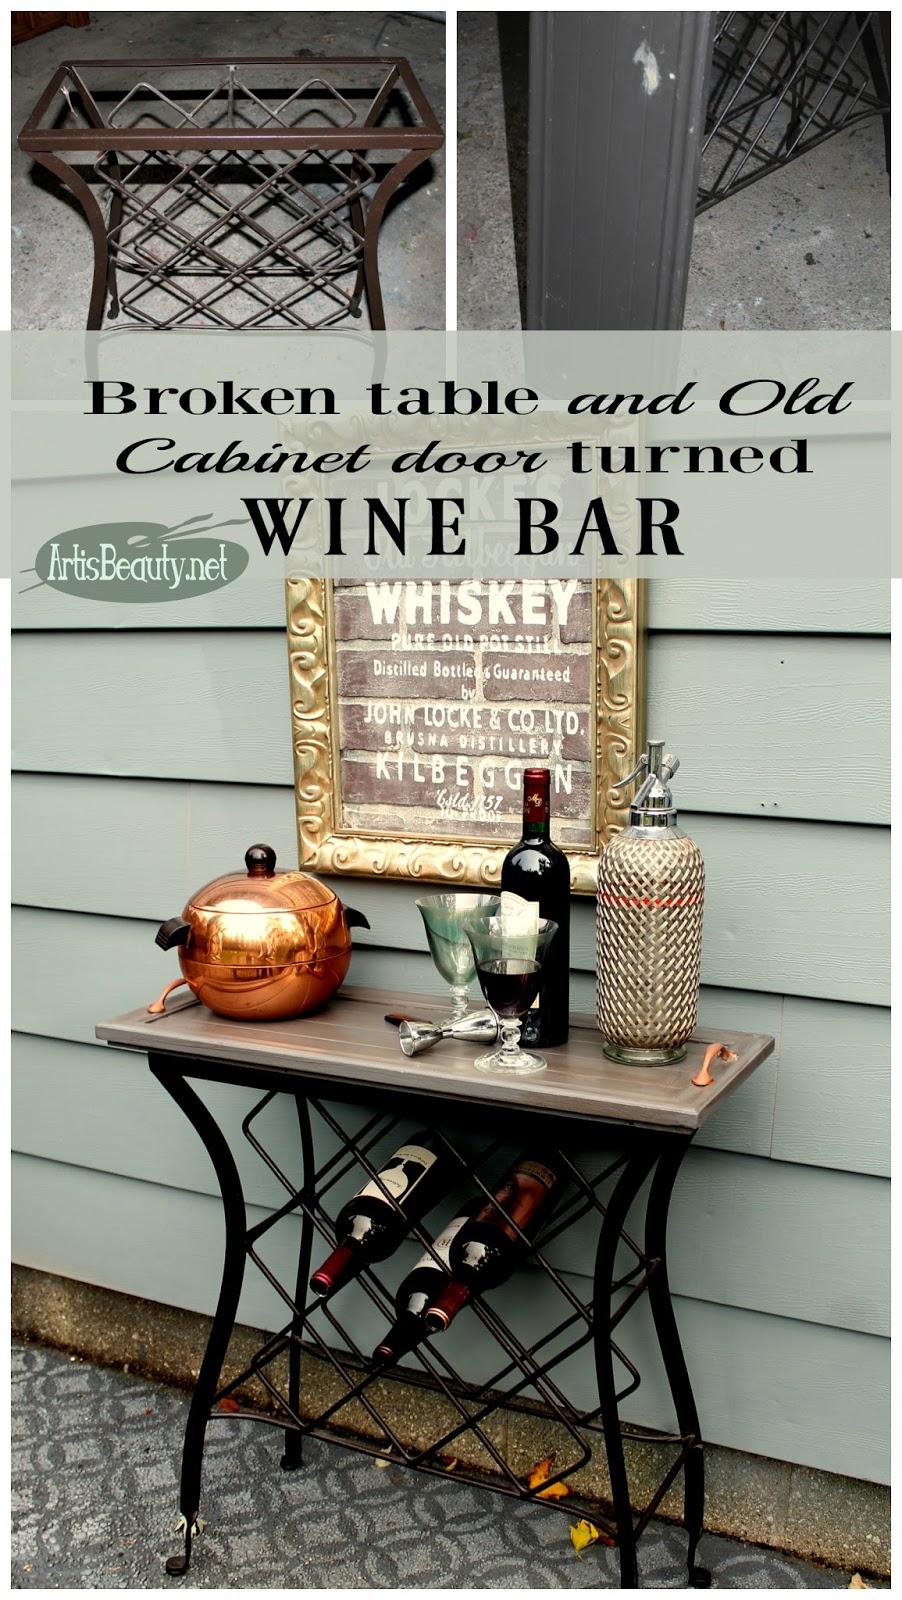 ART IS BEAUTY BROKEN TABLE and Old Cabinet door turned